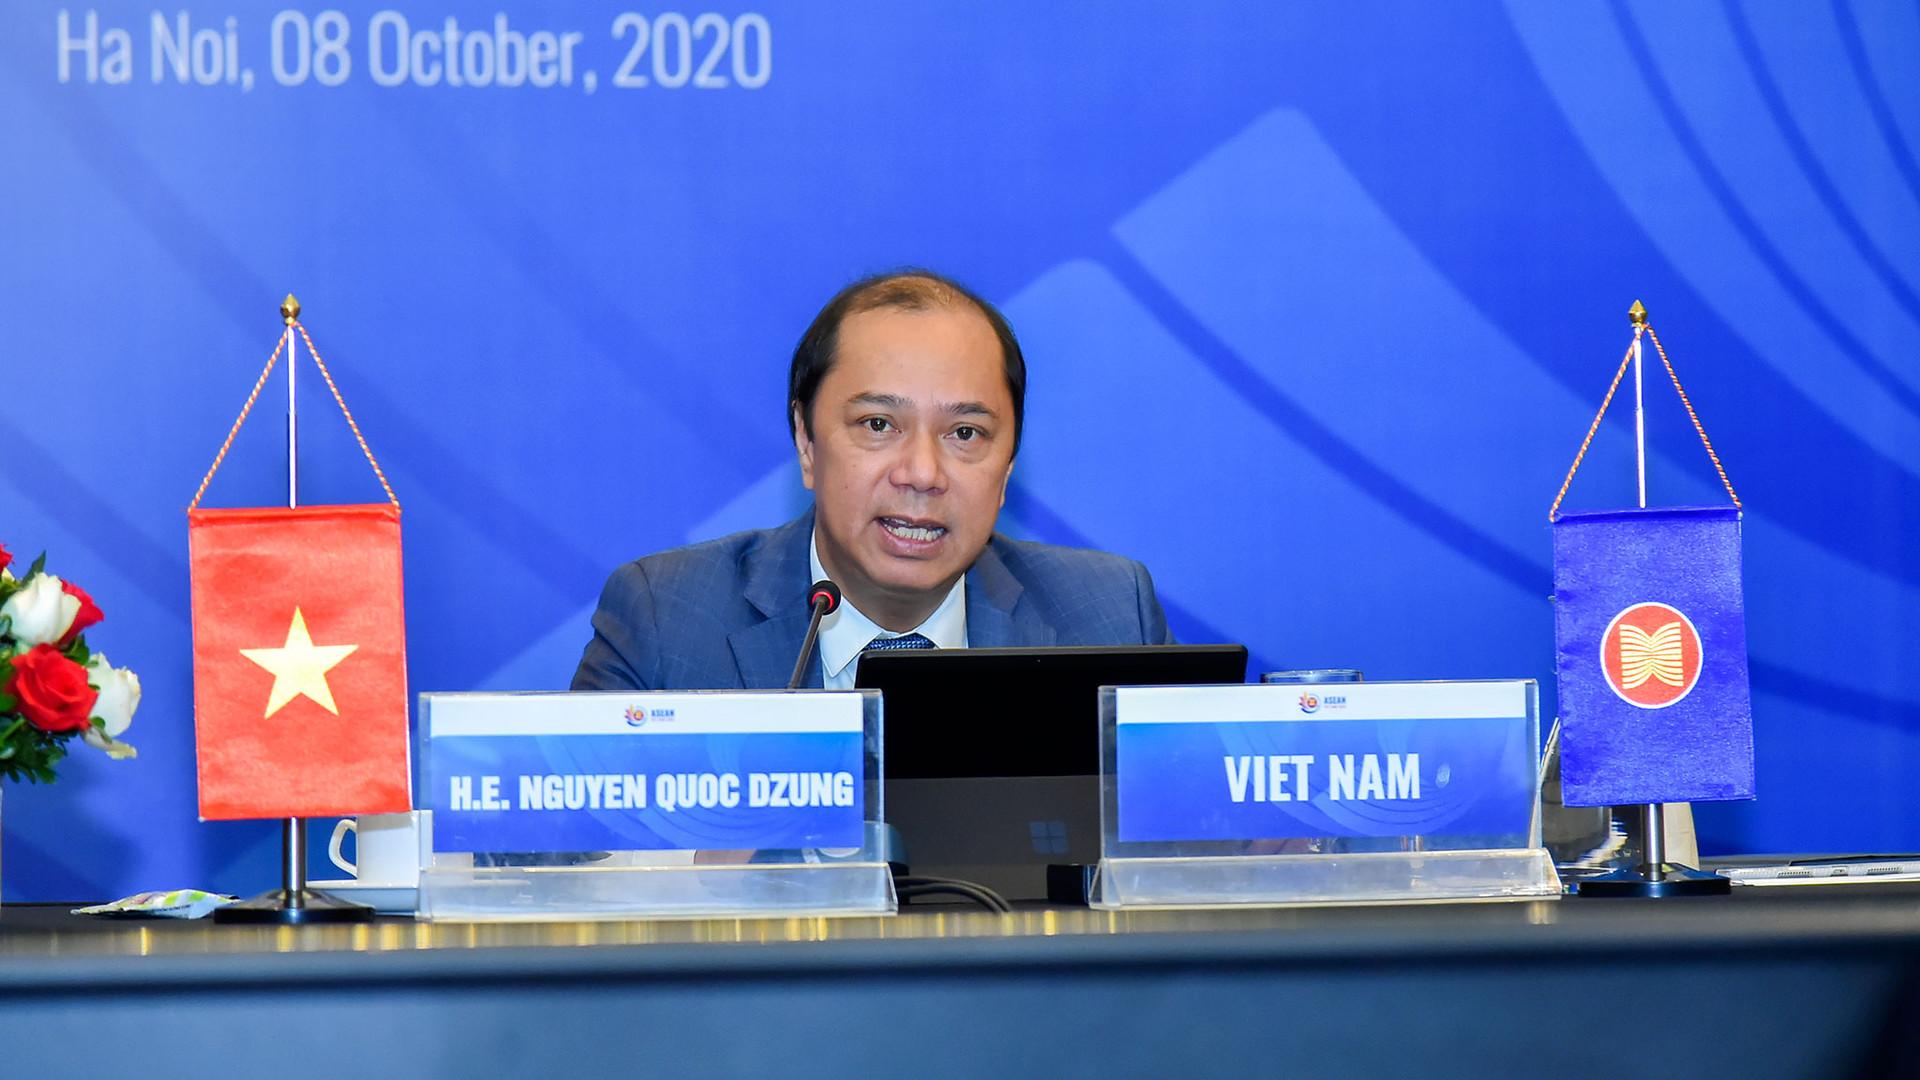 ASEAN tiếp tục họp về việc Timor-Leste xin gia nhập ASEAN